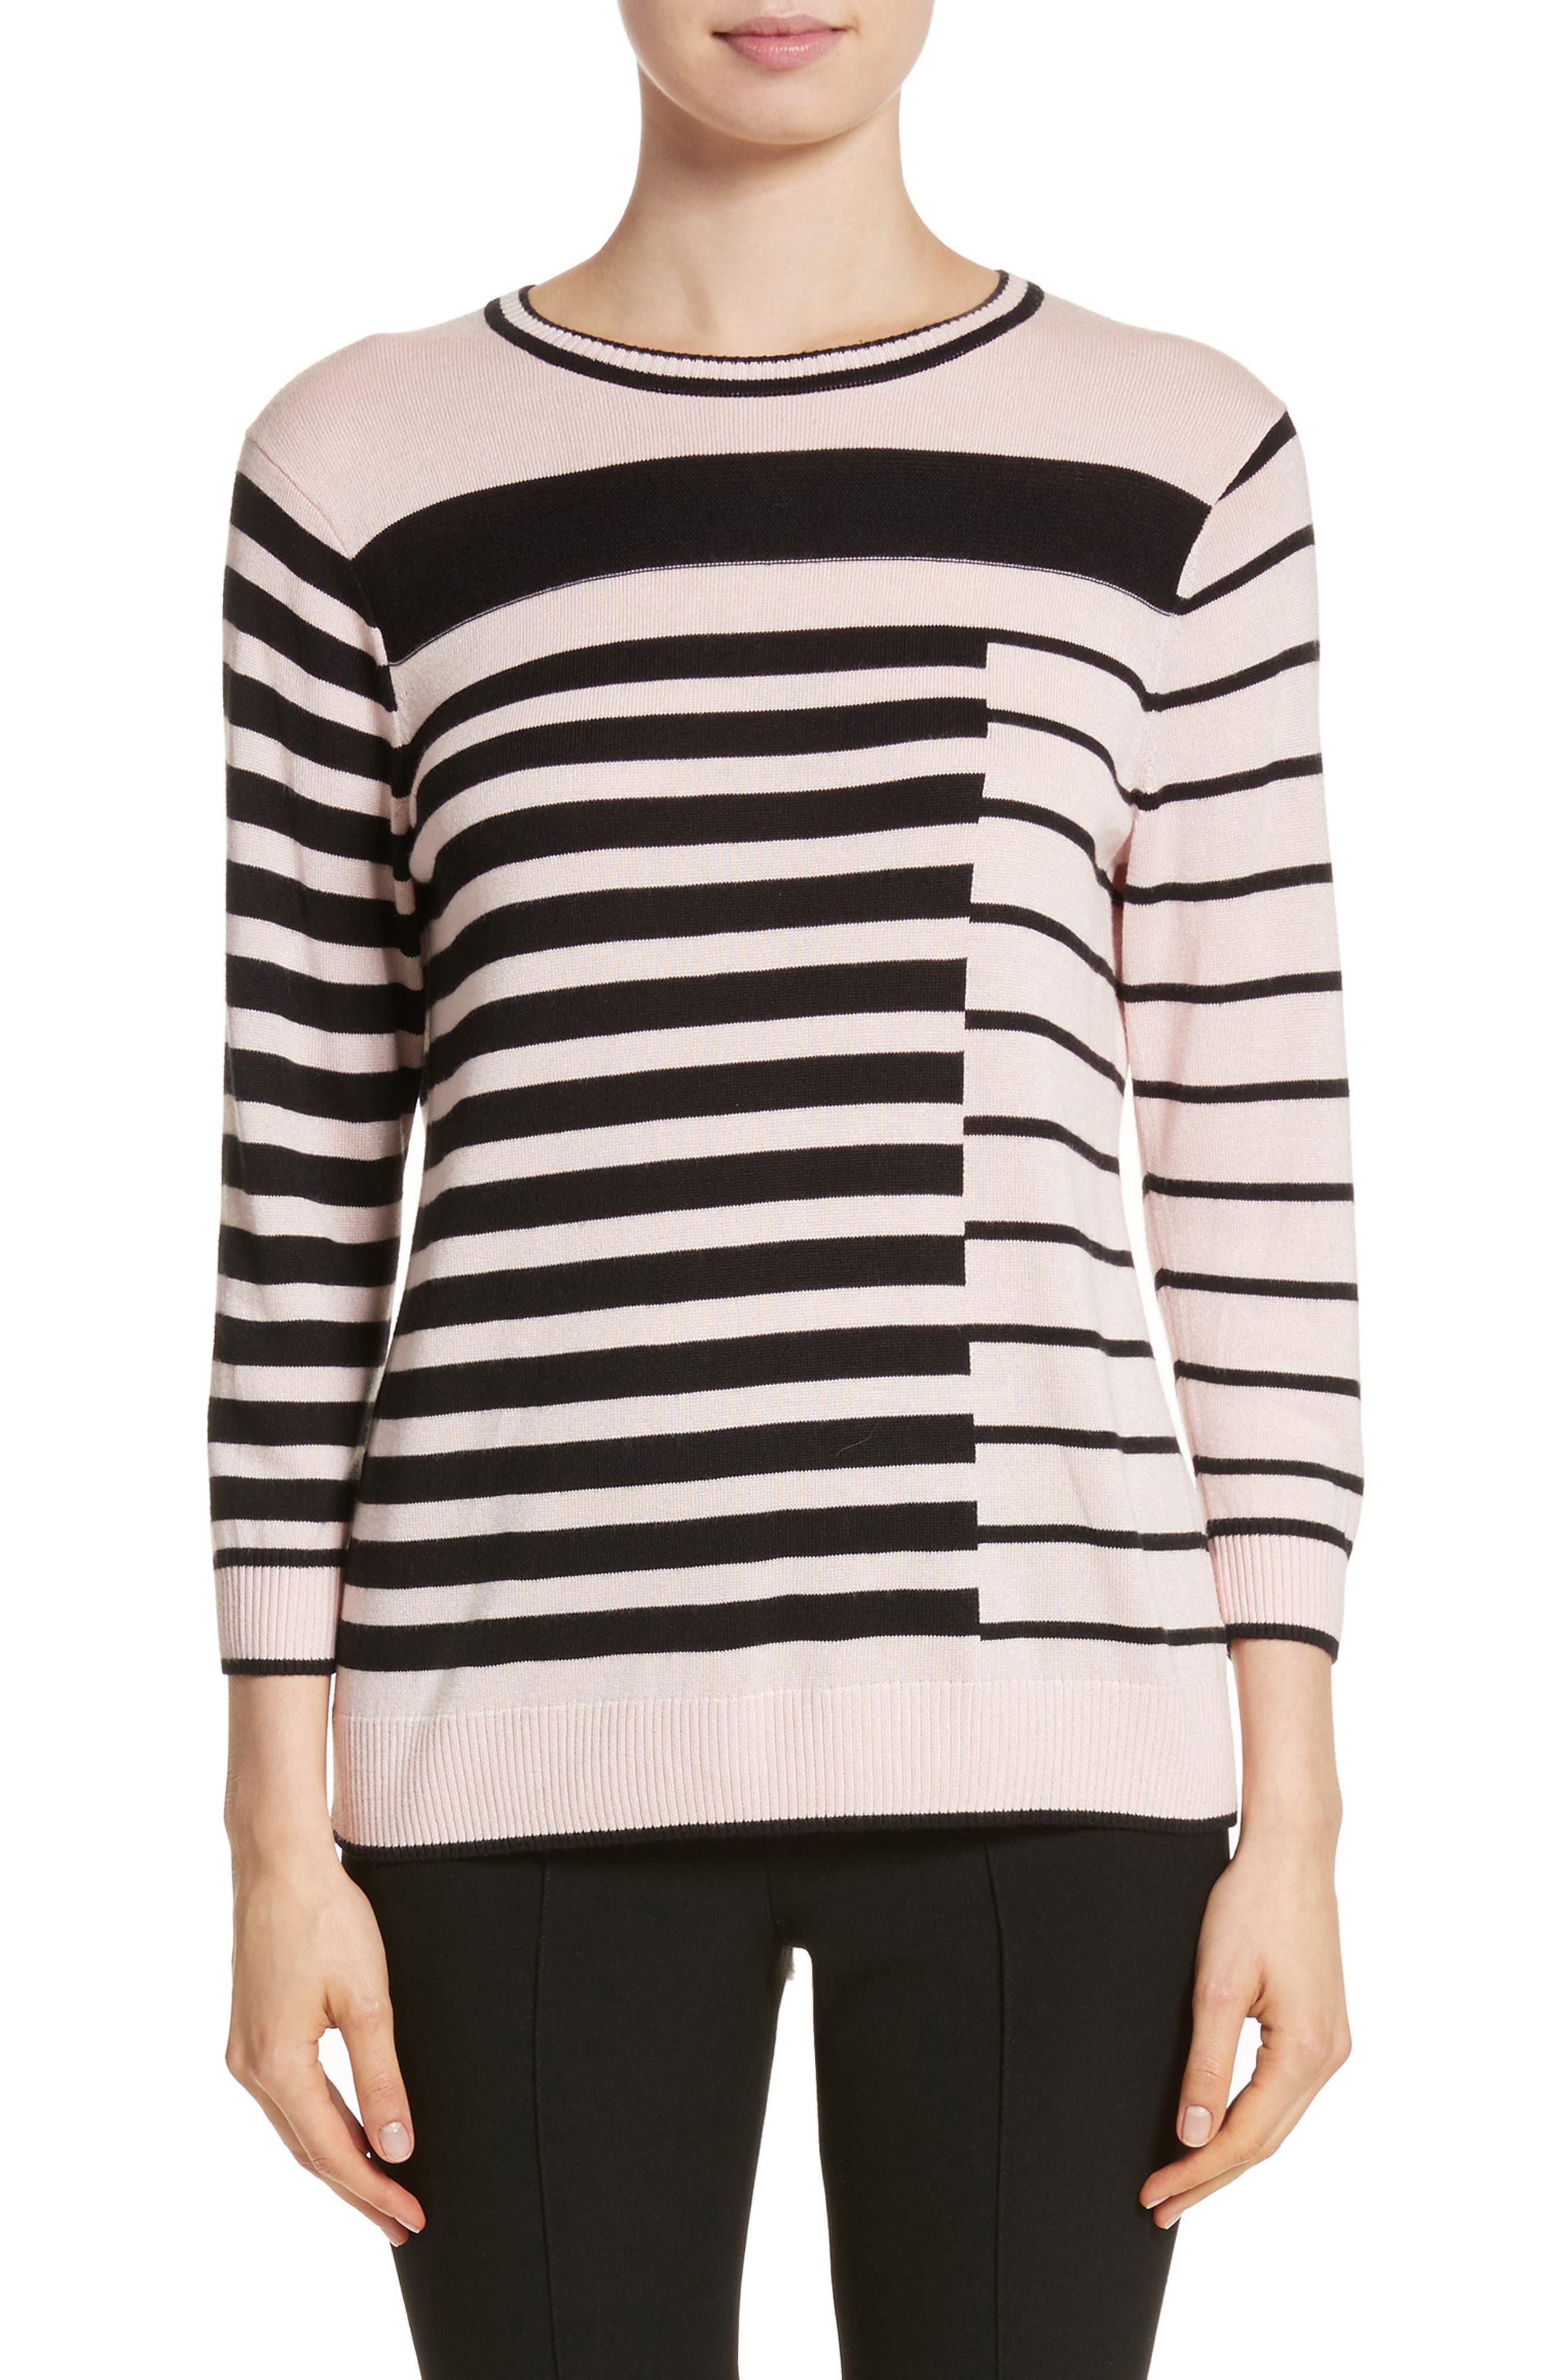 St. John Collection Intarsia Stripe Sweater